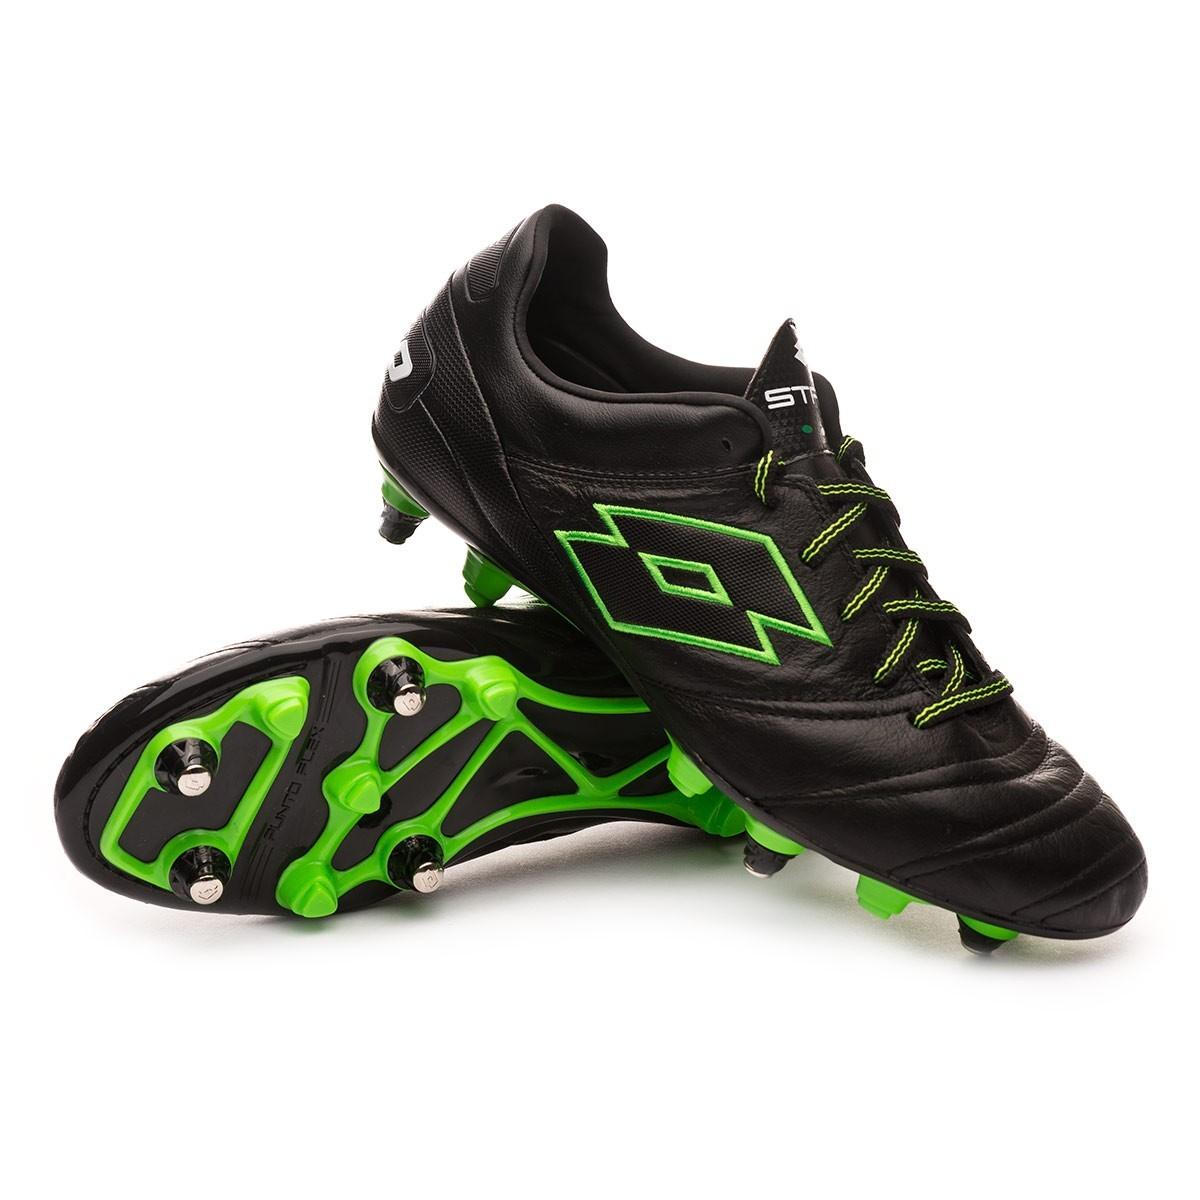 00d01e1fb Football Boots Lotto Stadio 45 SGX Black-Mint - Football store Fútbol  Emotion